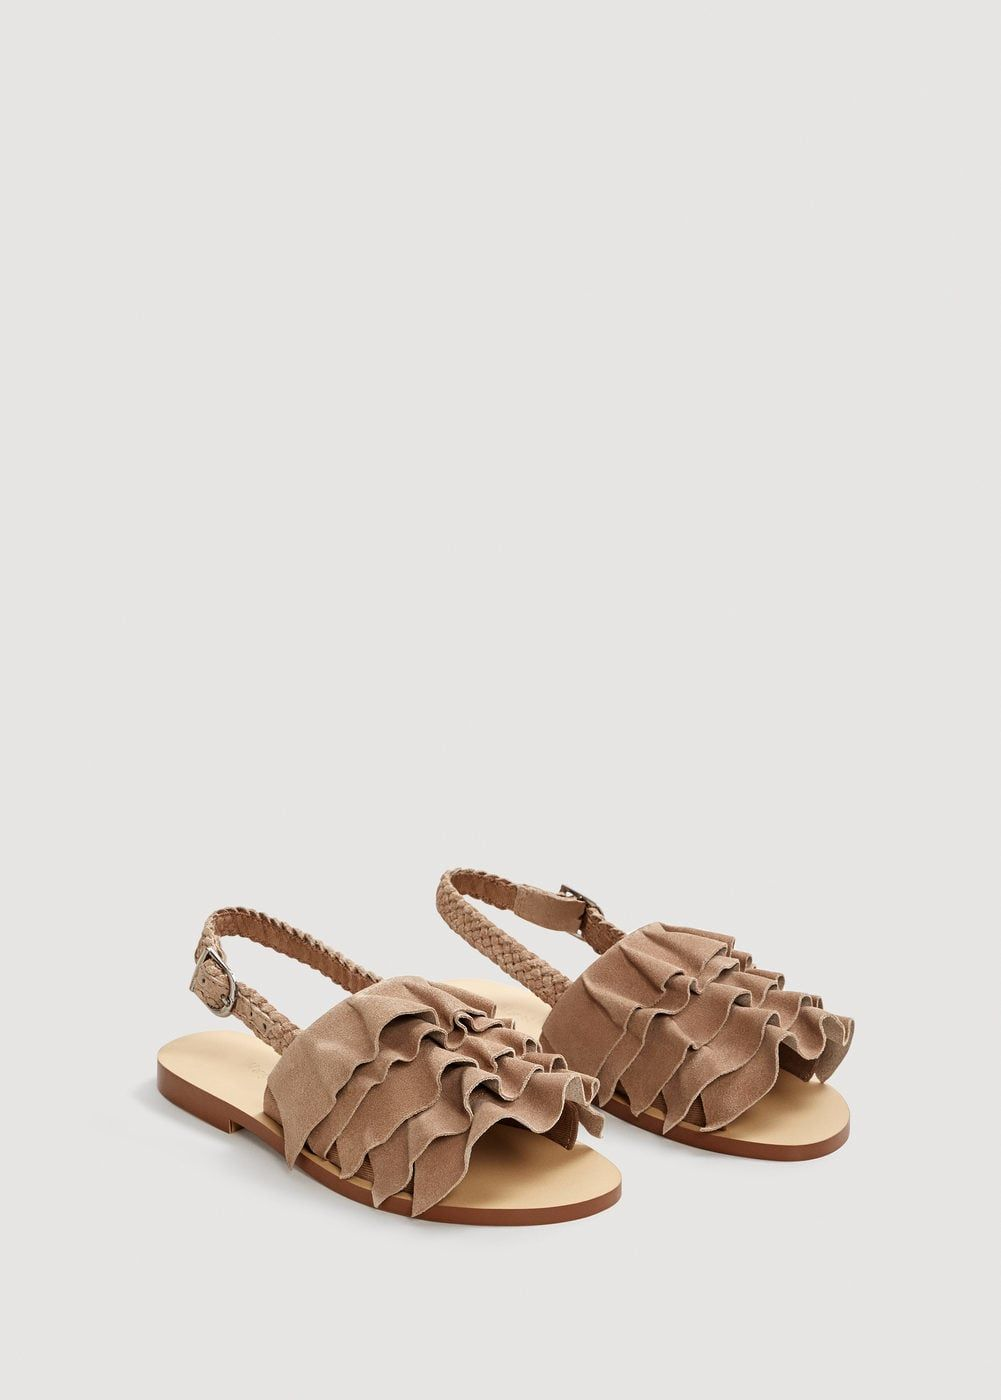 Sandalia Volantes Para 2019Shoes En Niñas Piel Niña Zapatos CBQrtshdx